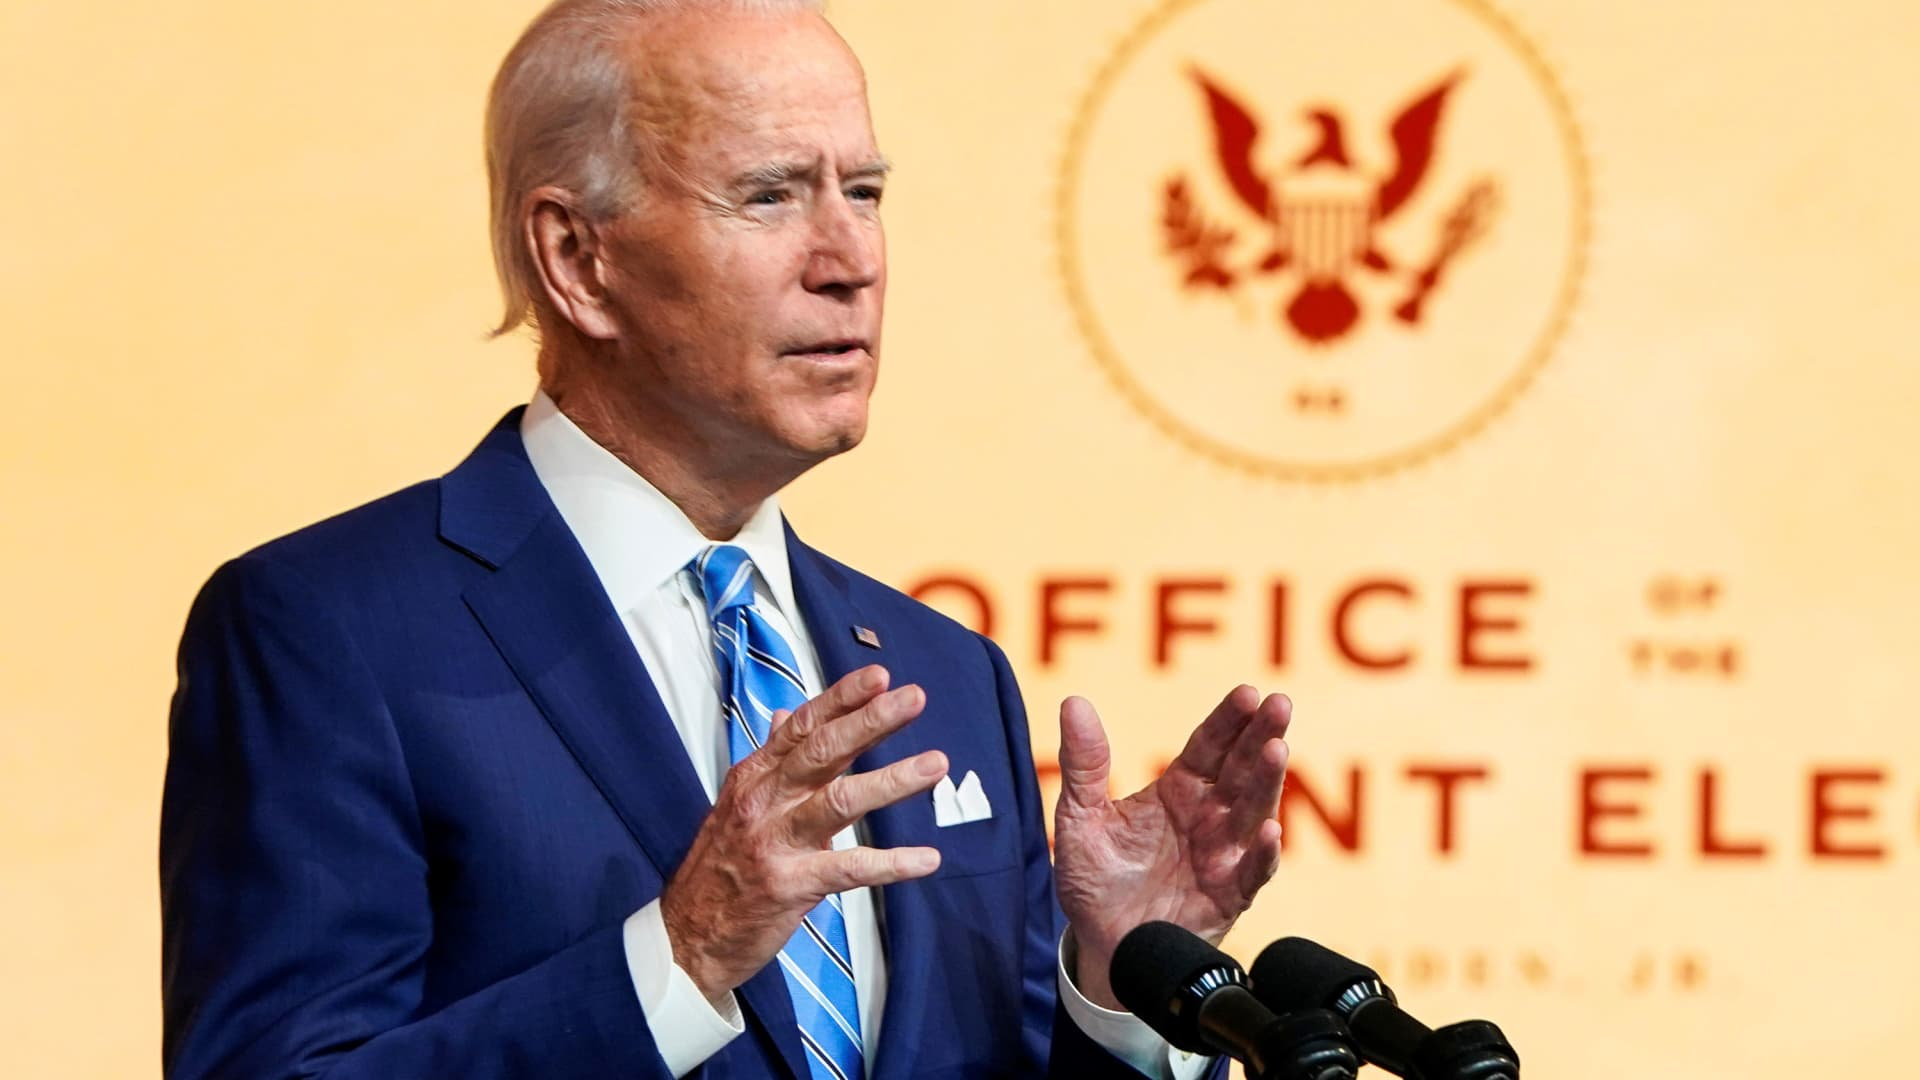 U.S. President-elect Joe Biden delivers a pre-Thanksgiving speech at his transition headquarters in Wilmington, Delaware, November 25, 2020.